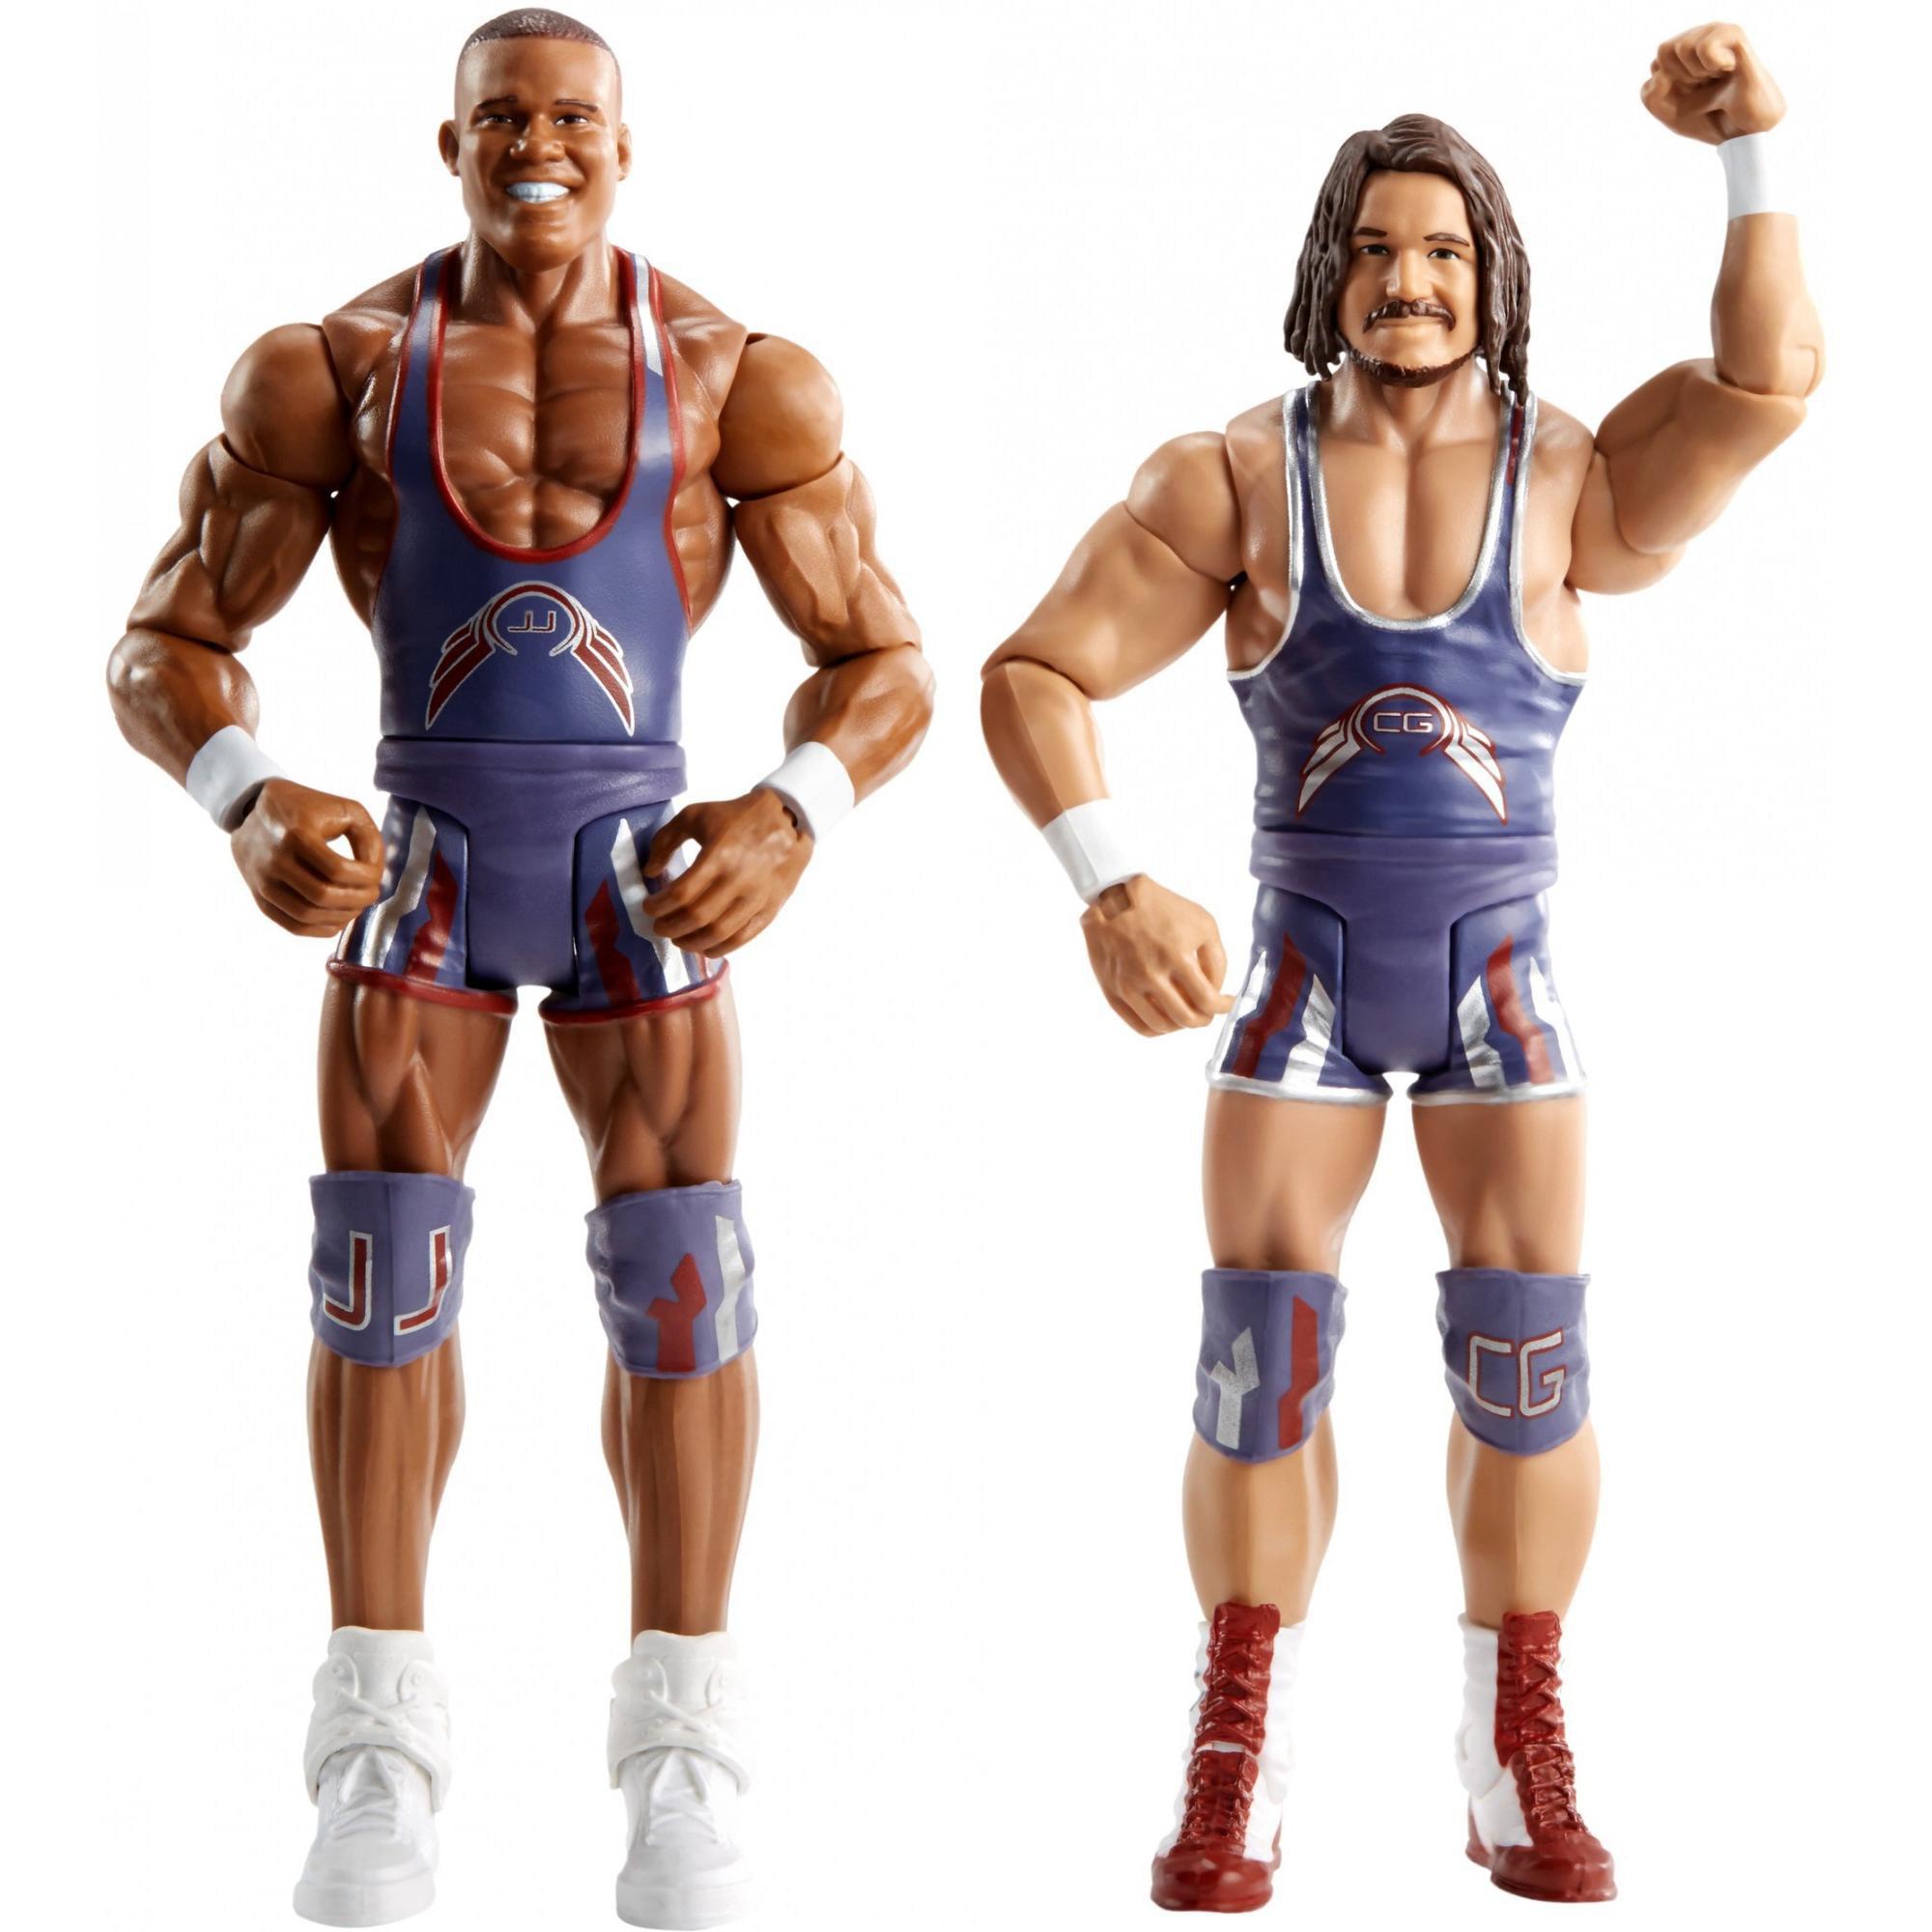 WWE Jason Jordan and Chad Gable Figure 2-Pack by Mattel